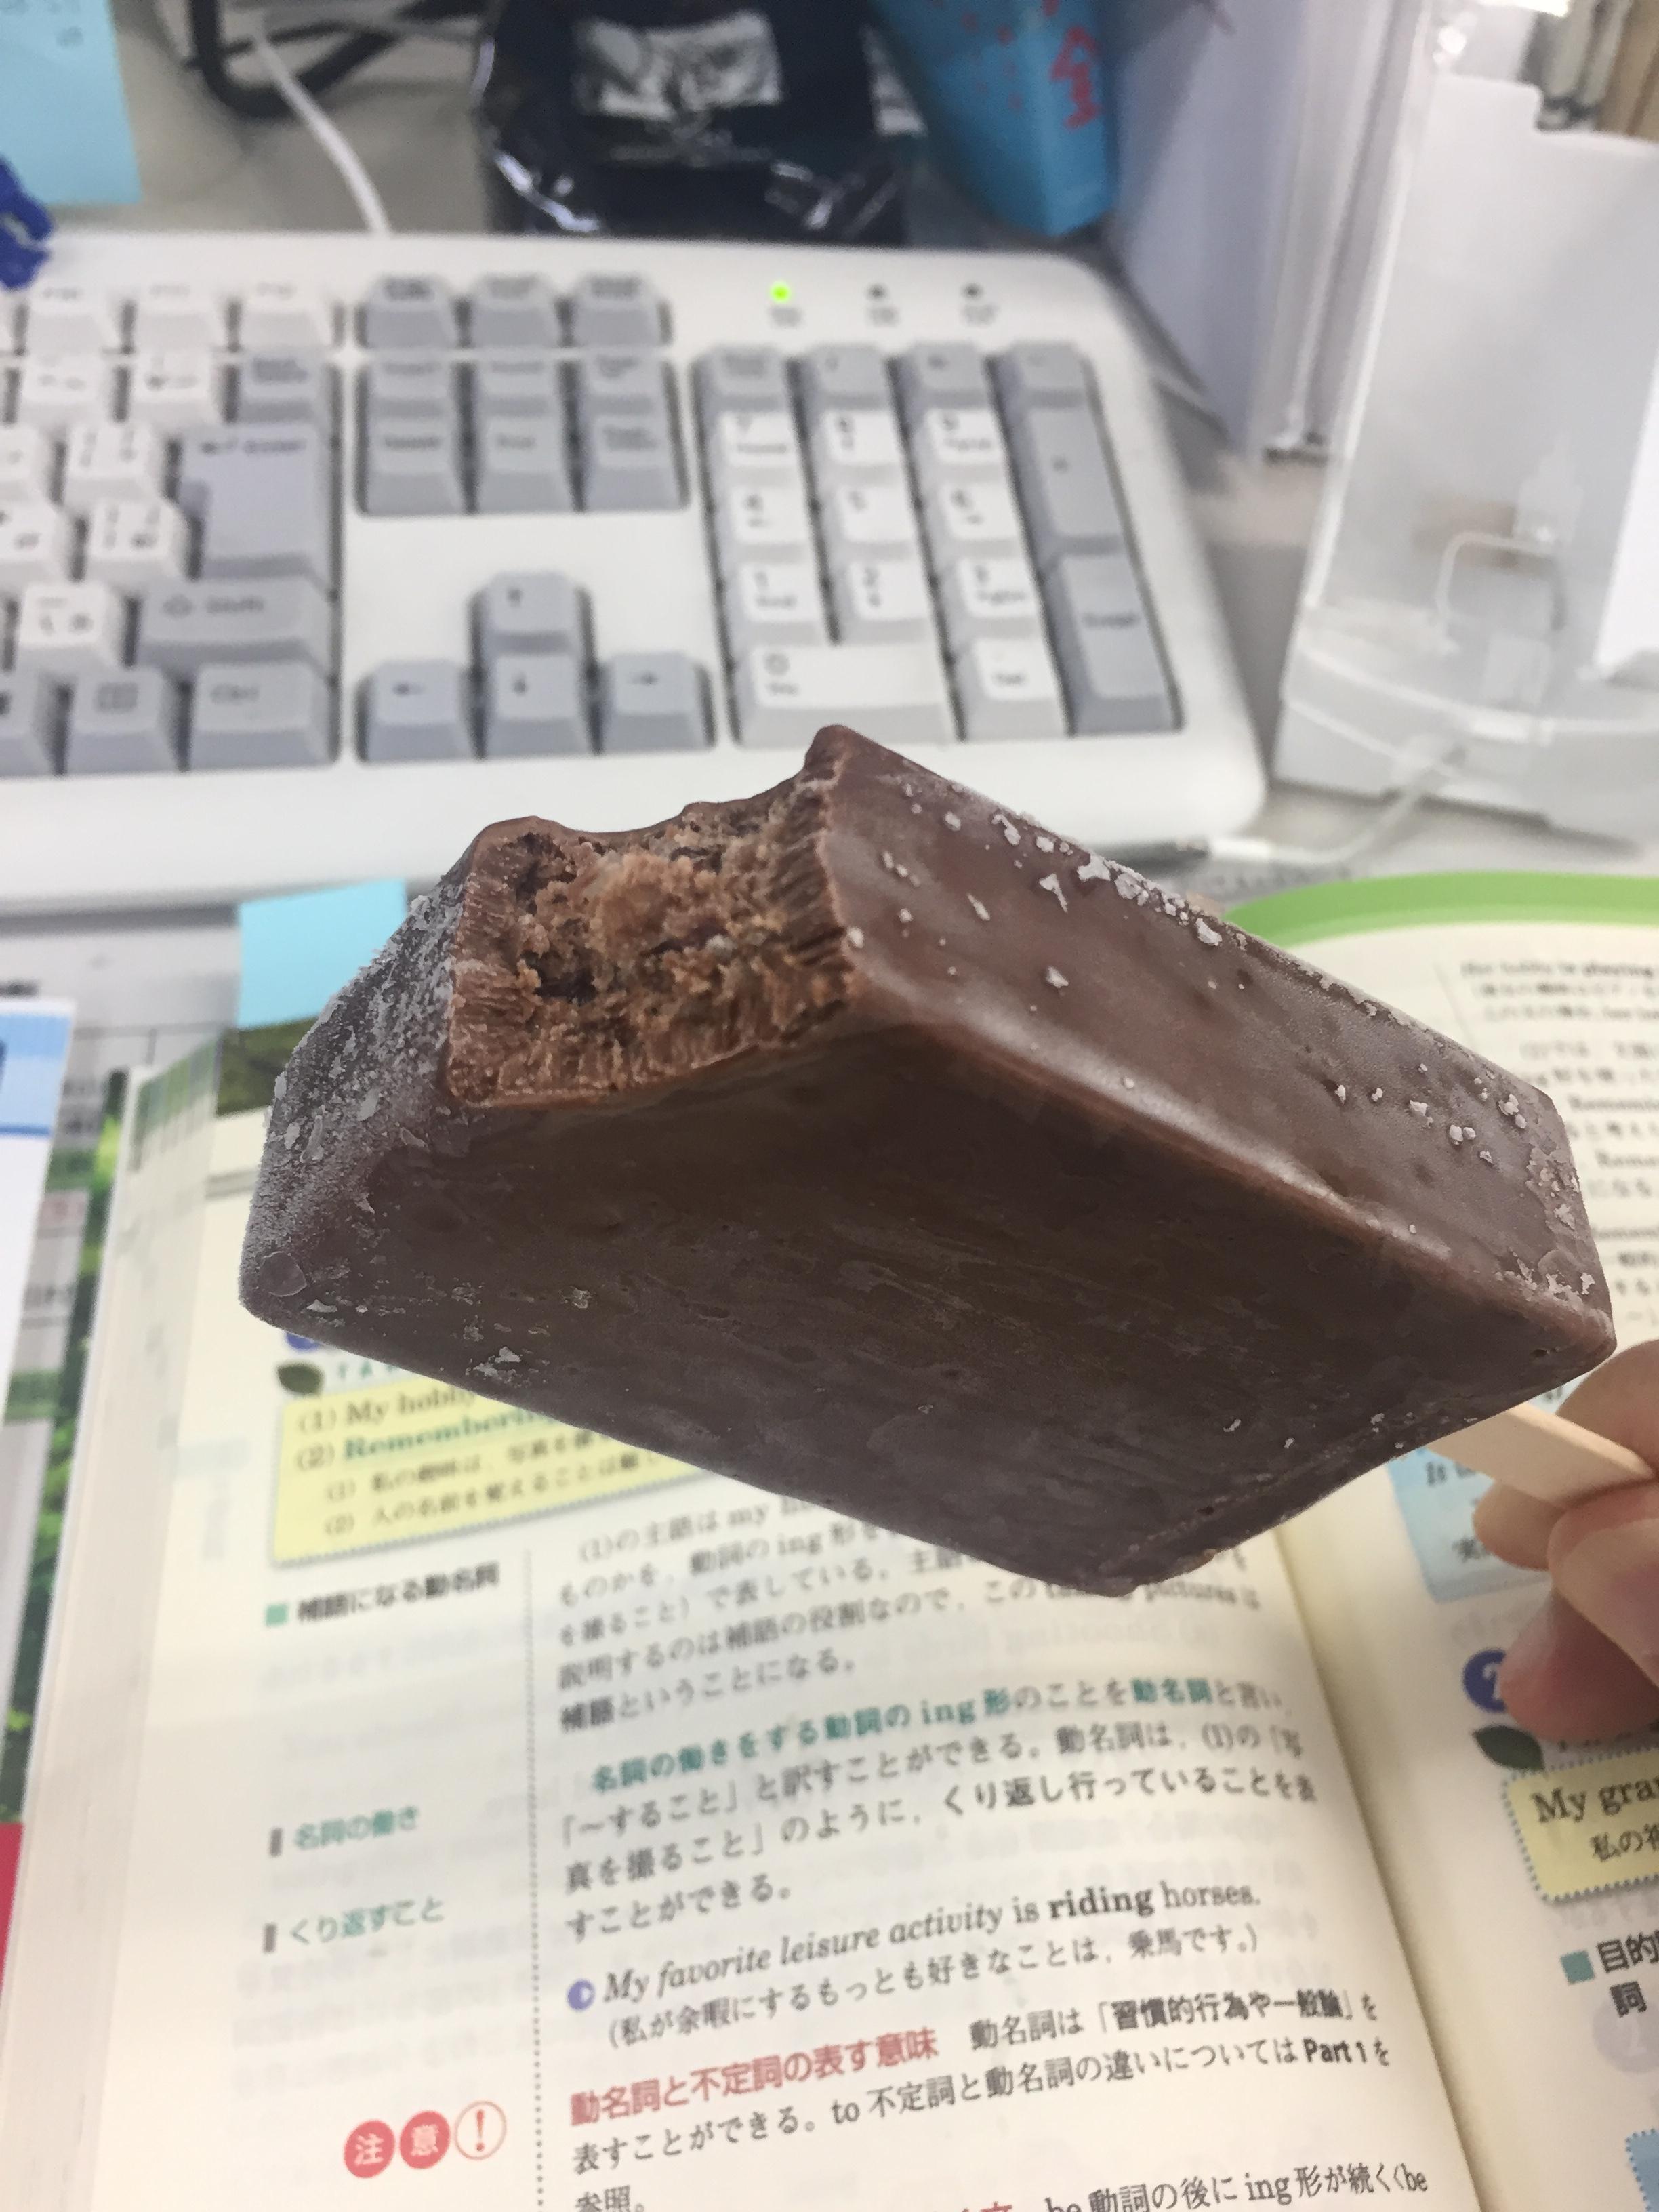 https://www.r-ac.jp/campus/osaka/blog/img/rrrrr.JPG